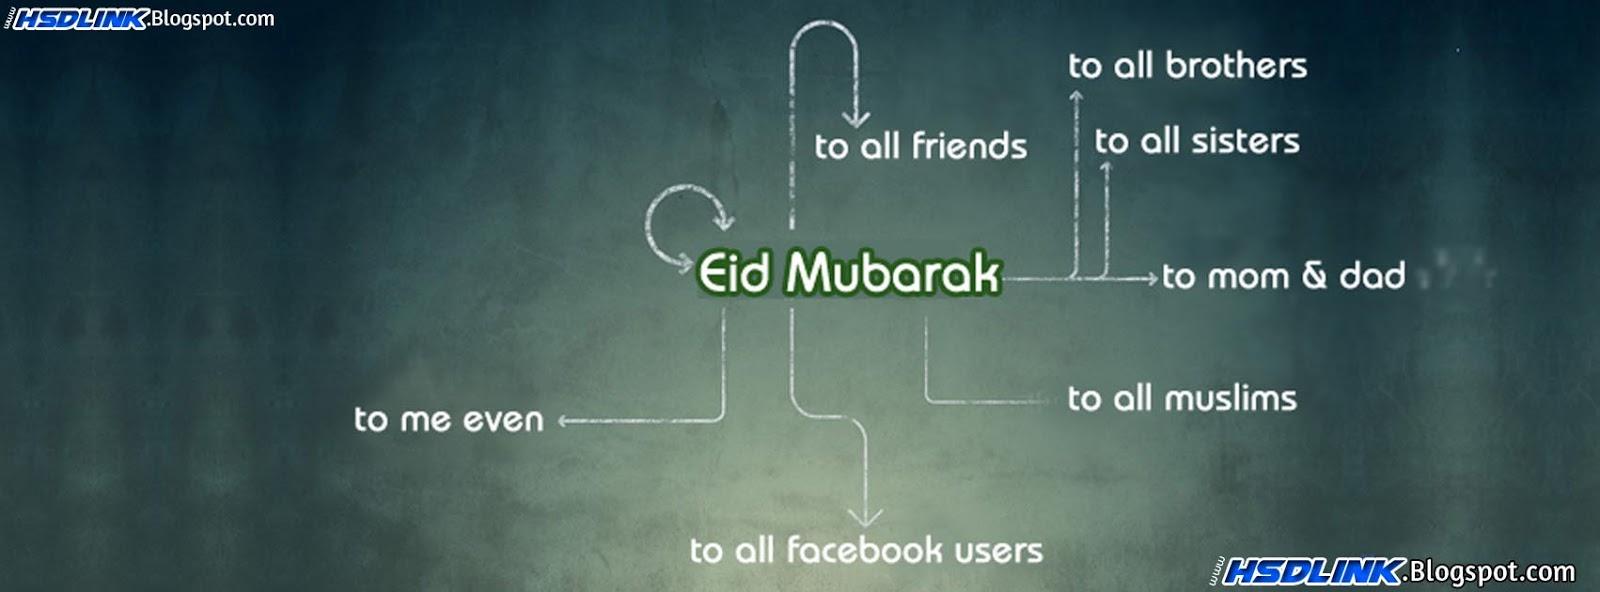 Download eid ul fitar eid mubarak wallpapers 2013 wallpaper hd.